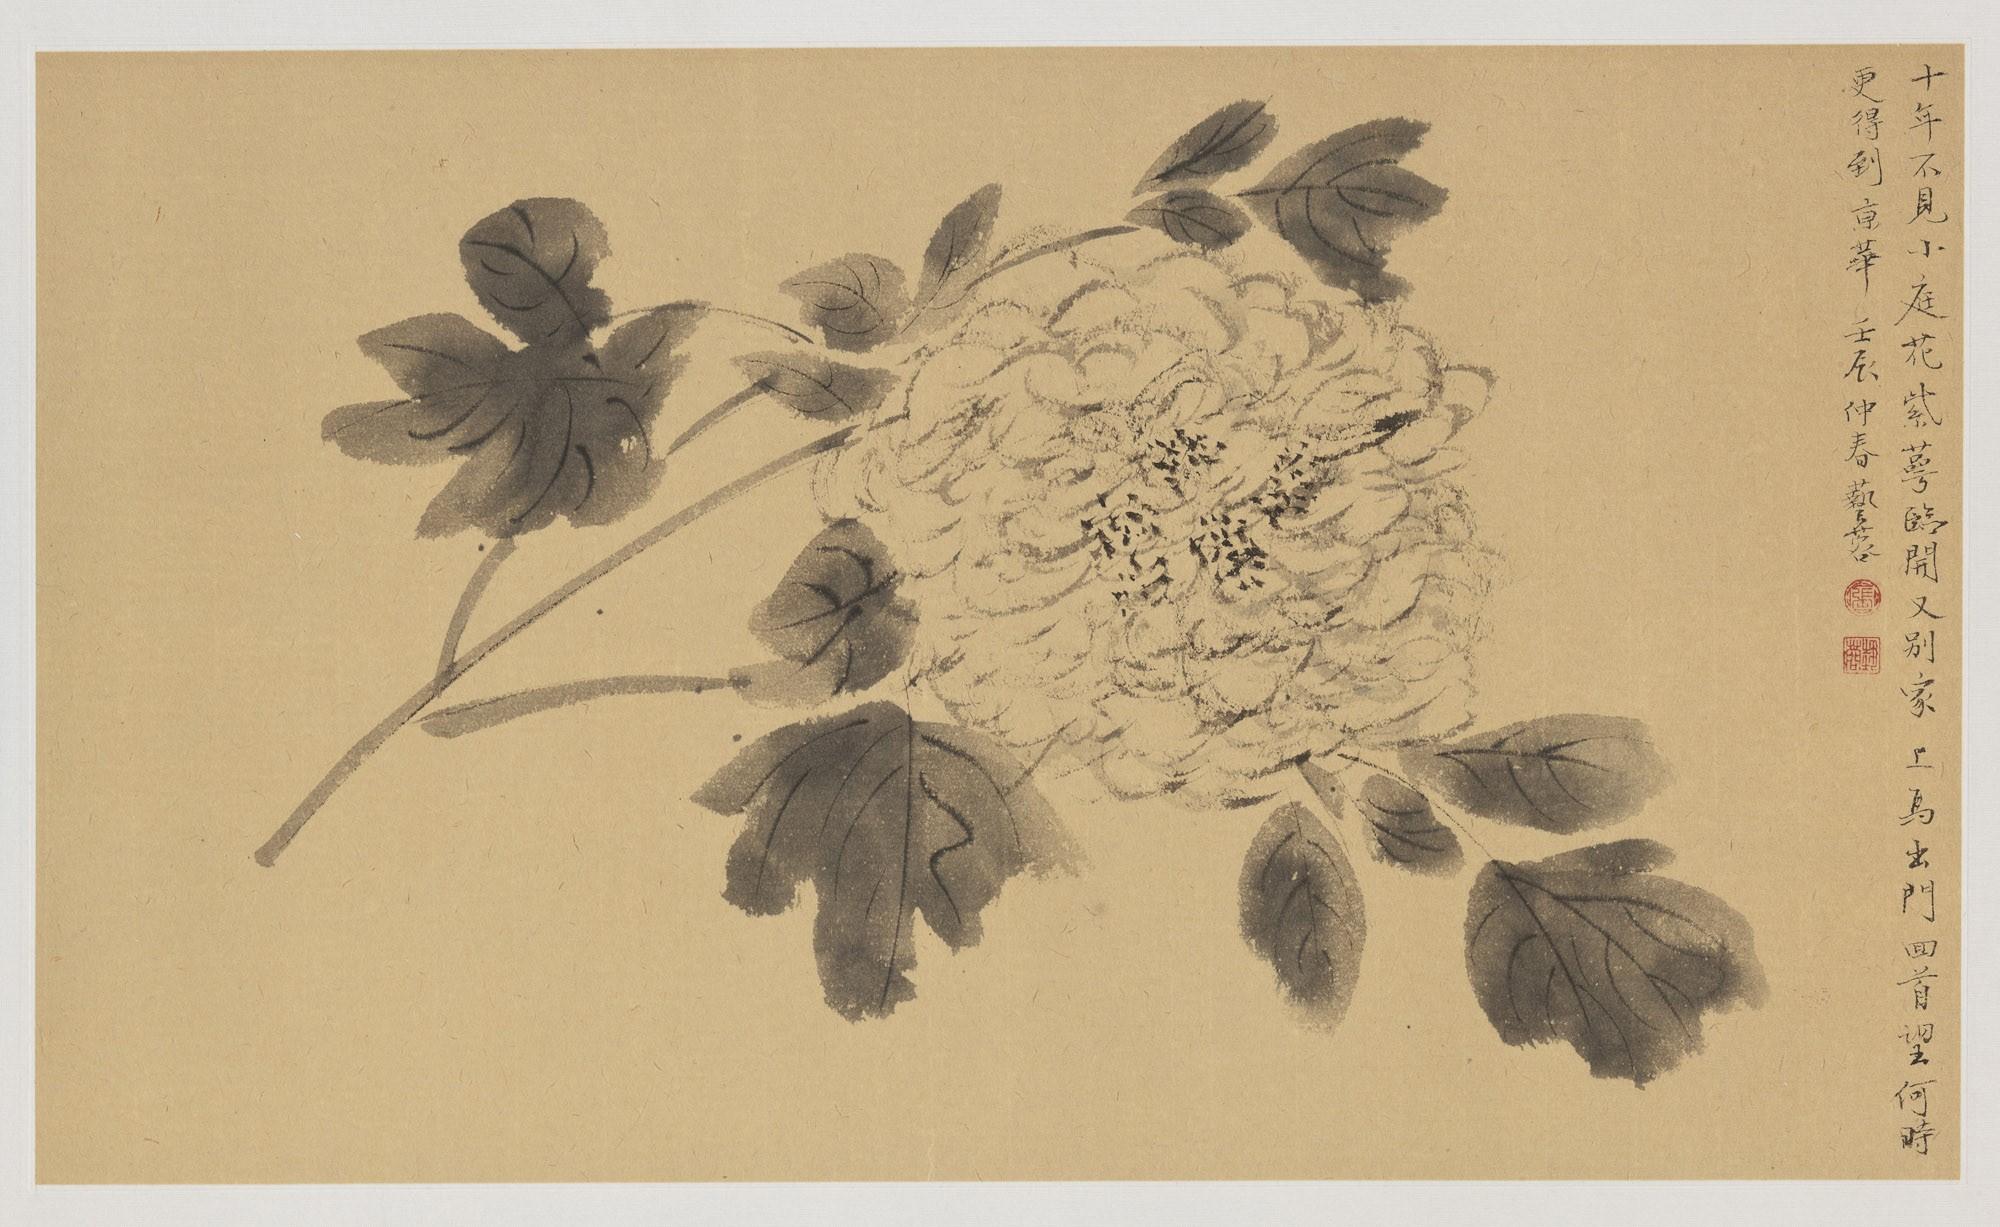 SINGLE PEONY BLOSSOM by Yirong Zhang